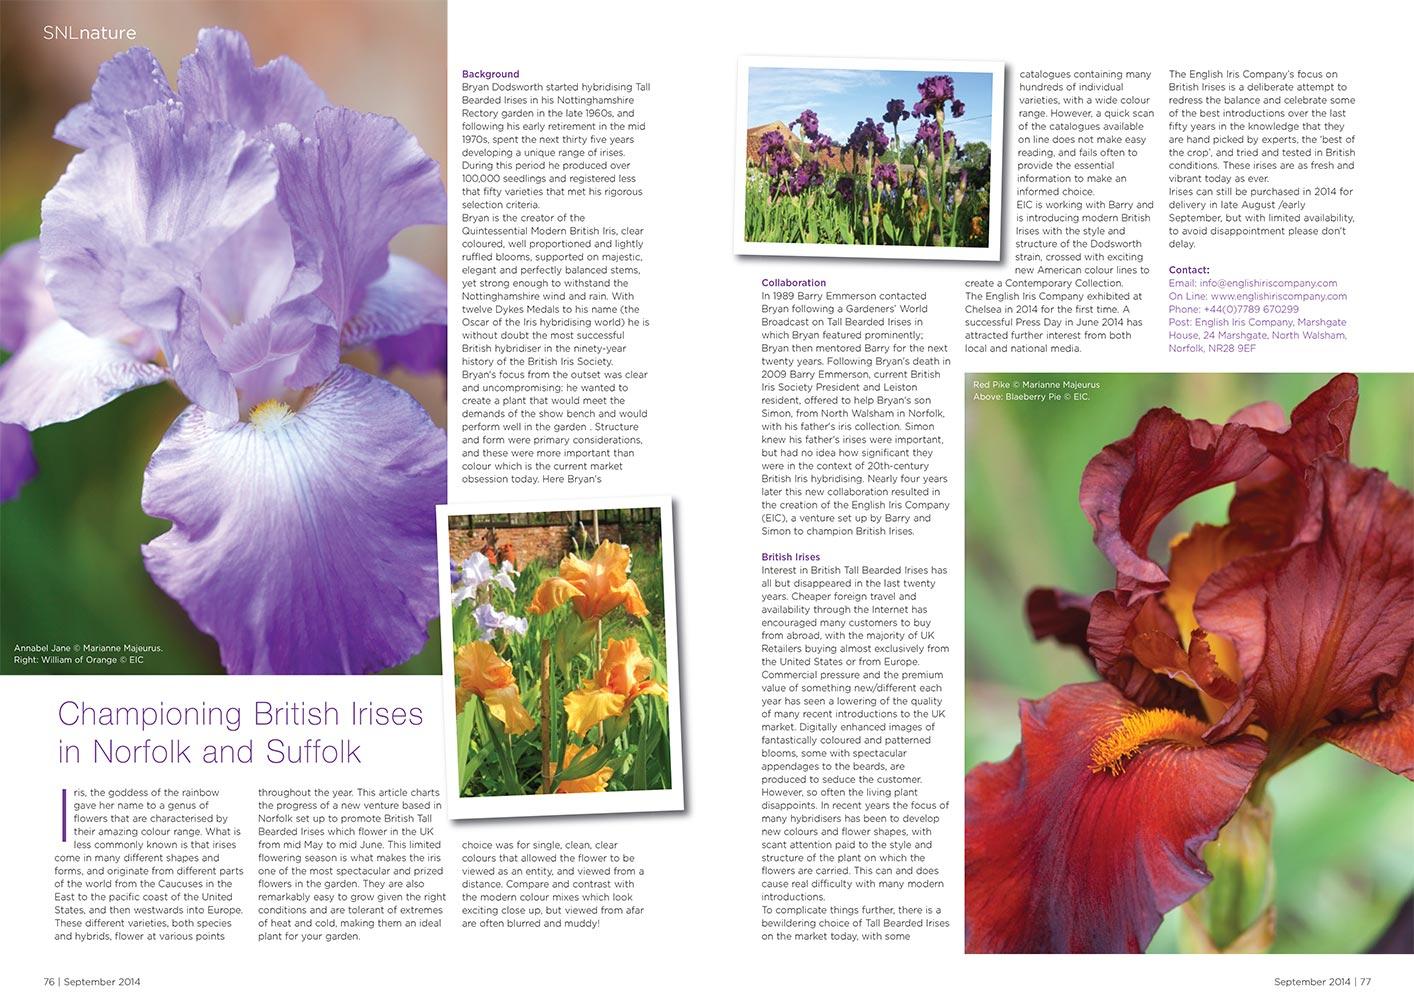 Norfok Suffolk Life Article September 2014